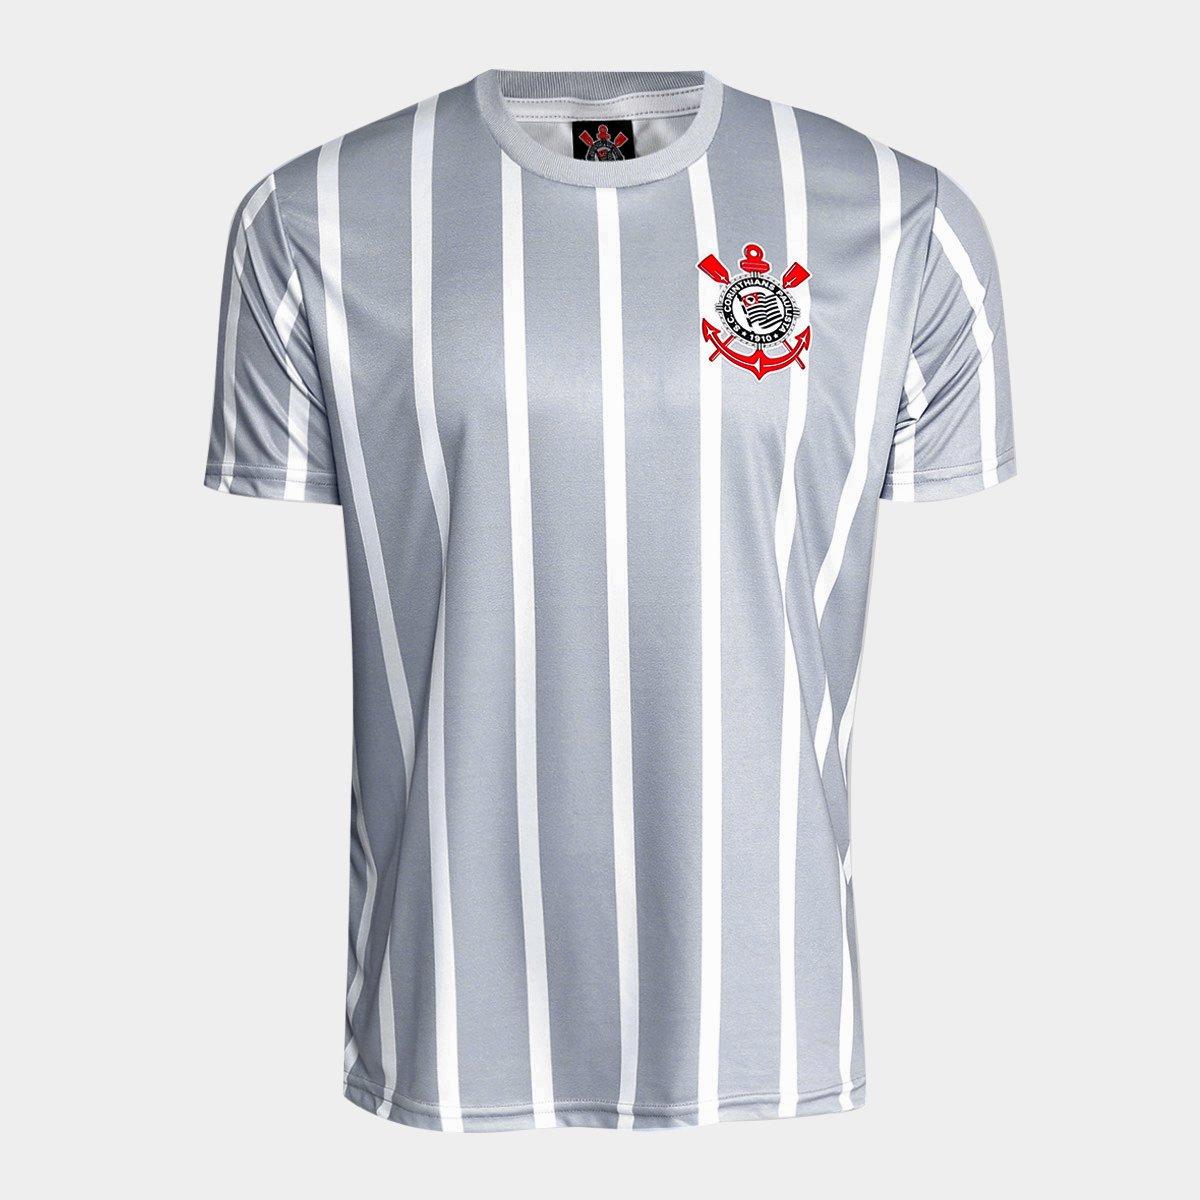 d6e917d949 Camisa Corinthians 2002 n° 7 Masculina - Branco e Cinza - Compre ...